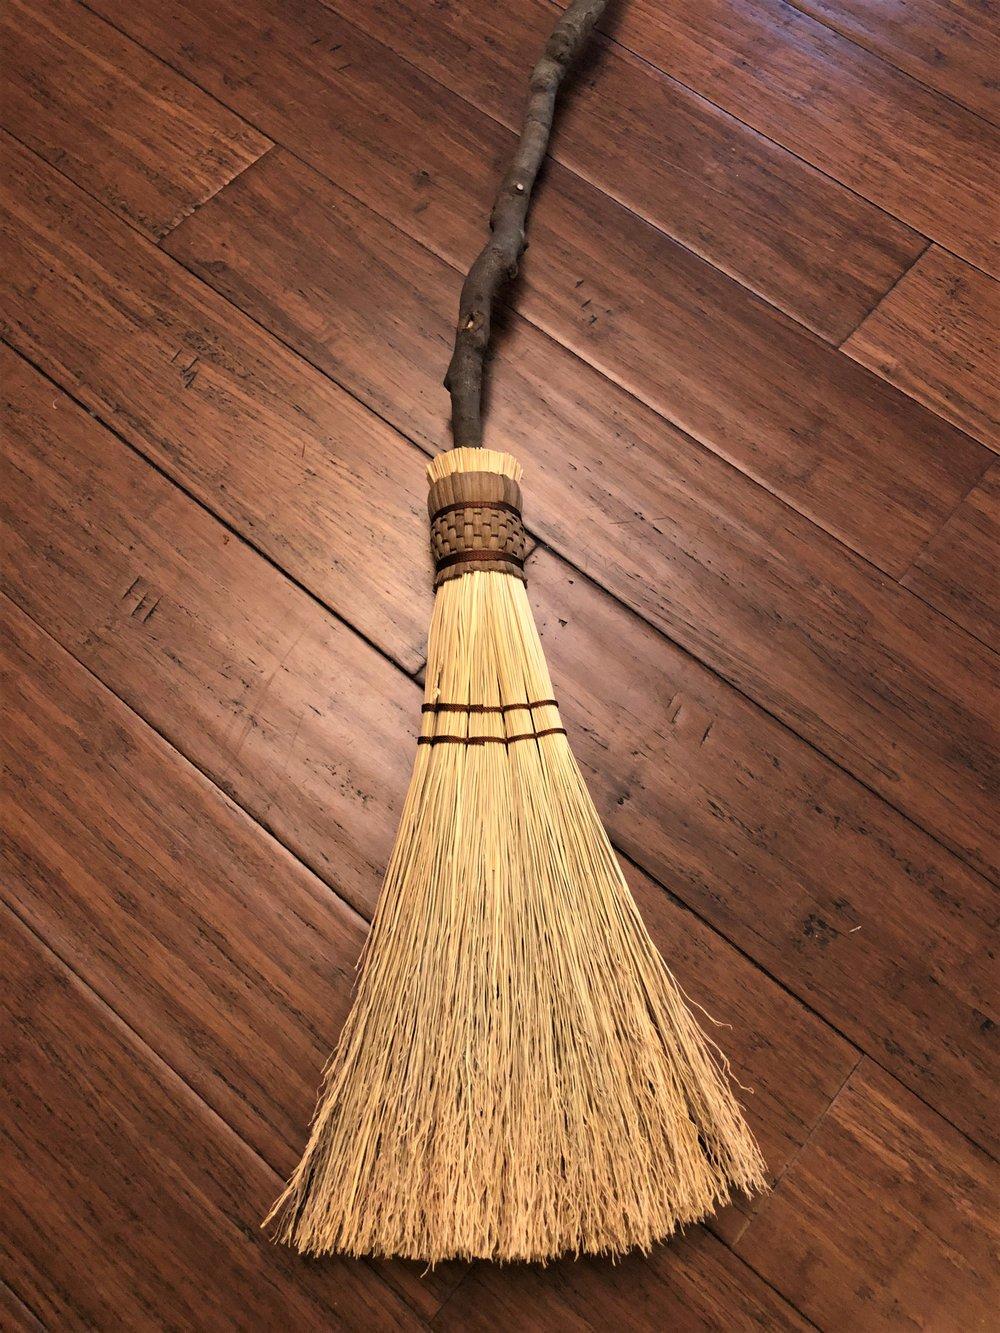 Why dream broom